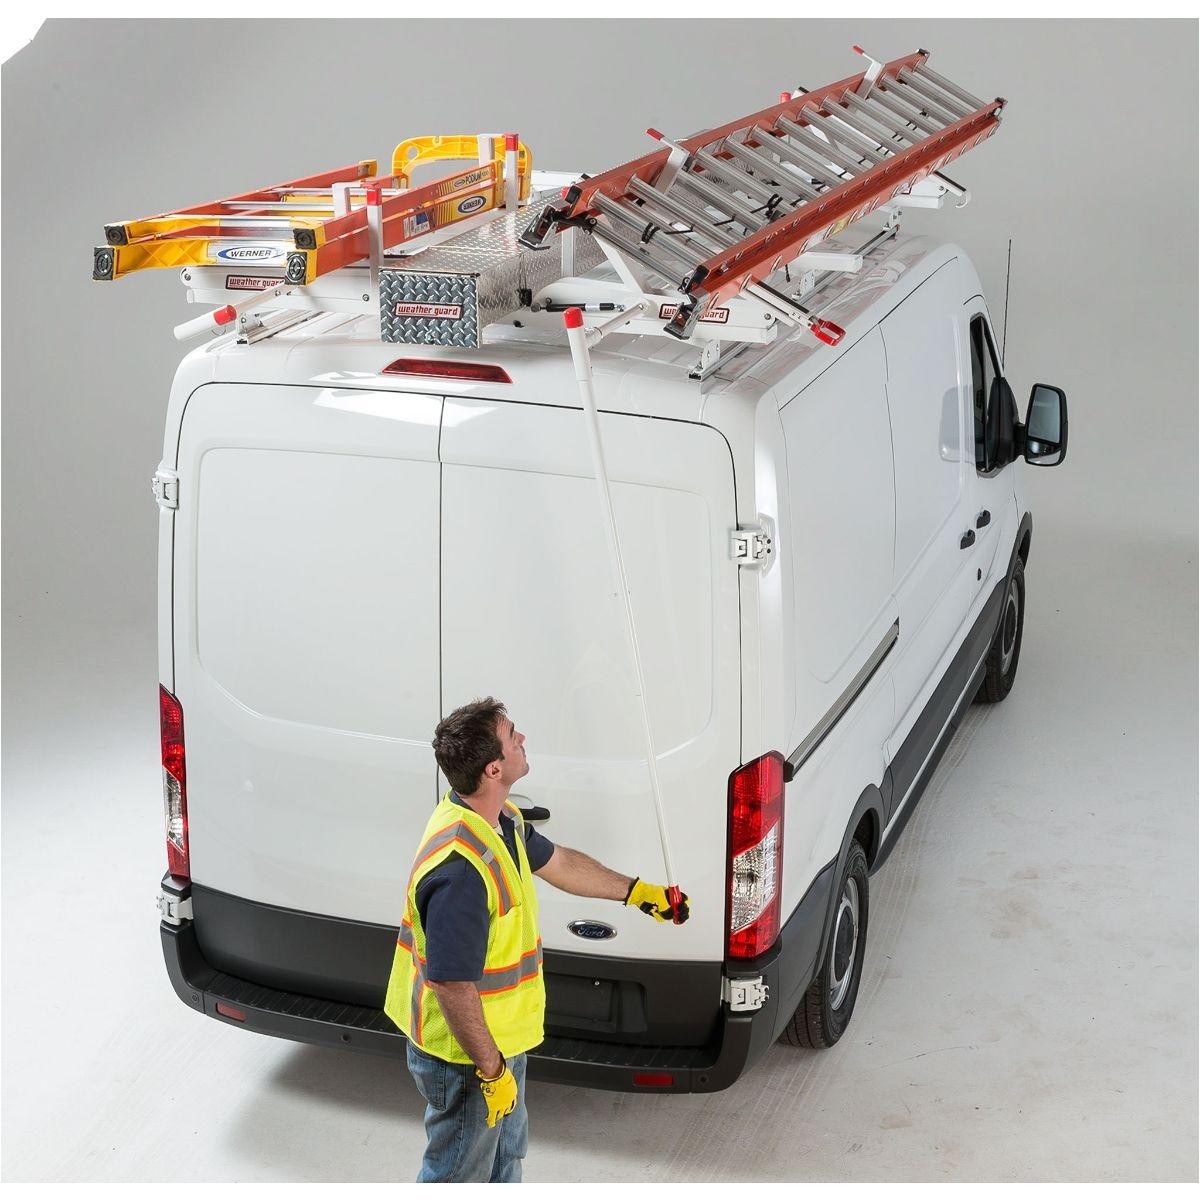 Weatherguard Ladder Racks for Vans Ezglide2 Van Racks Weather Guard Us